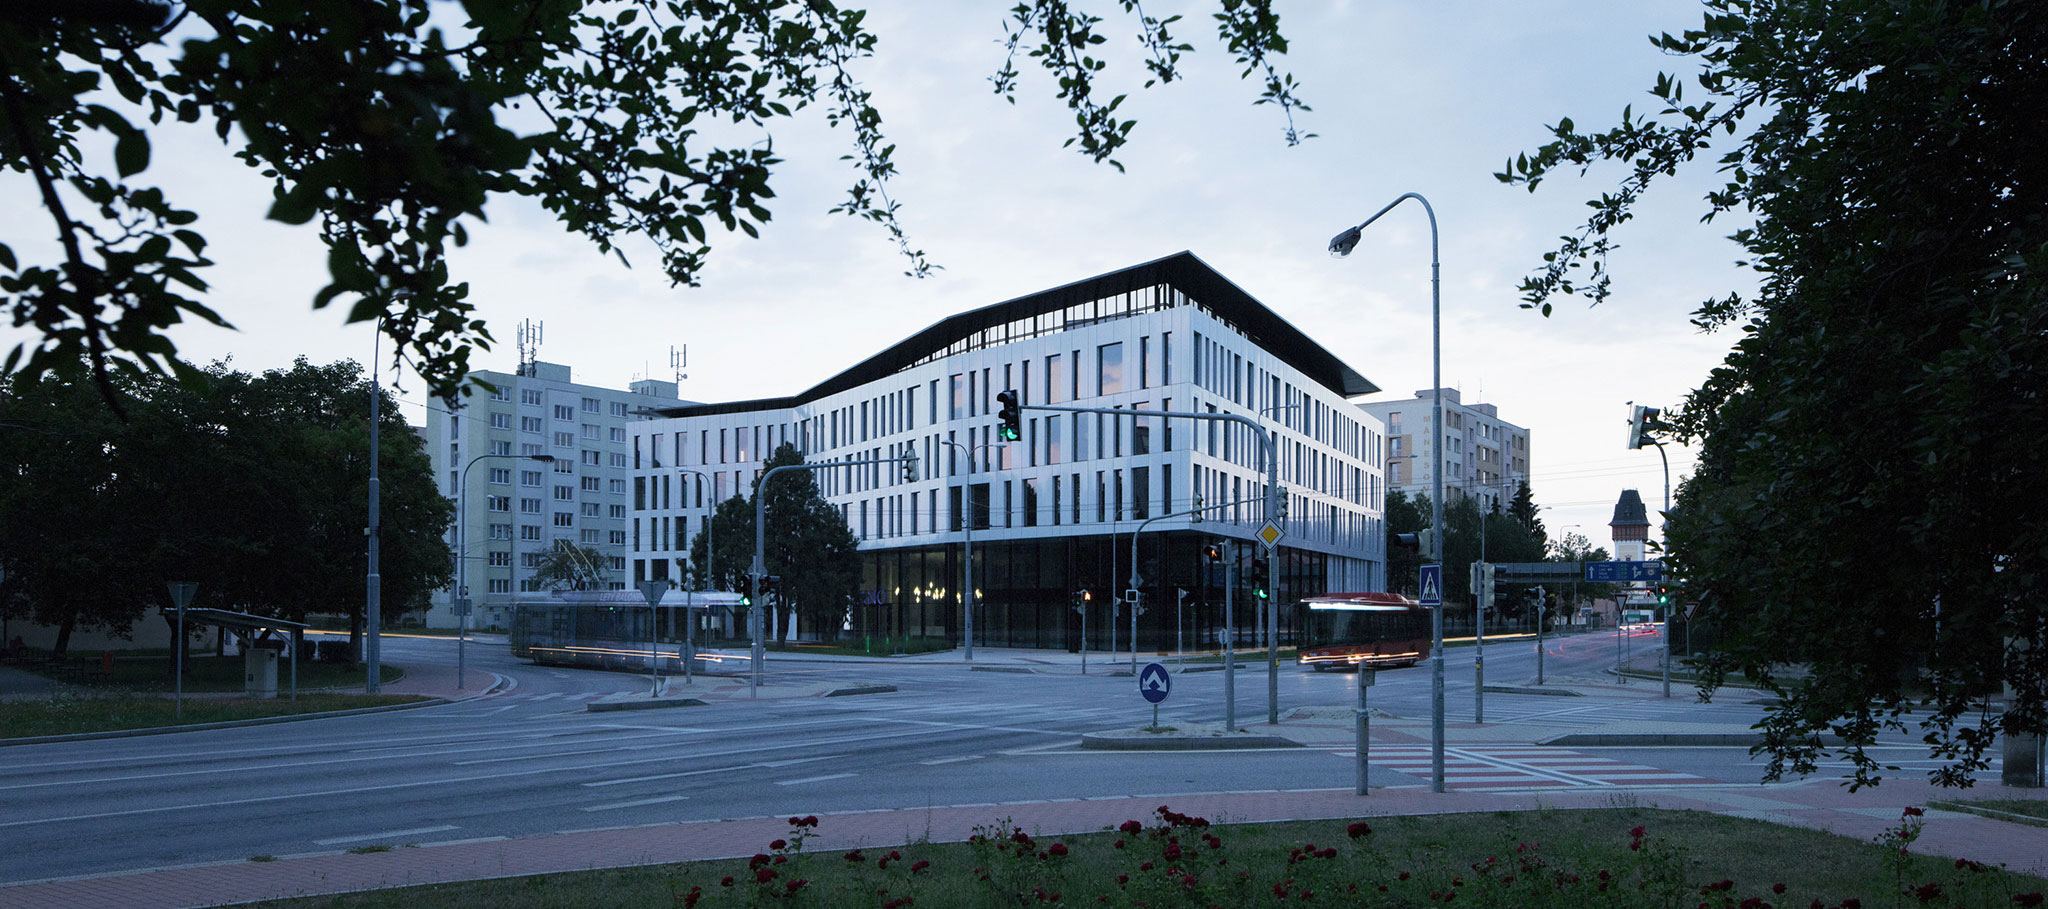 Centro de oficinas PIANO, por CMC architects. Fotografía © BoysPlayNice